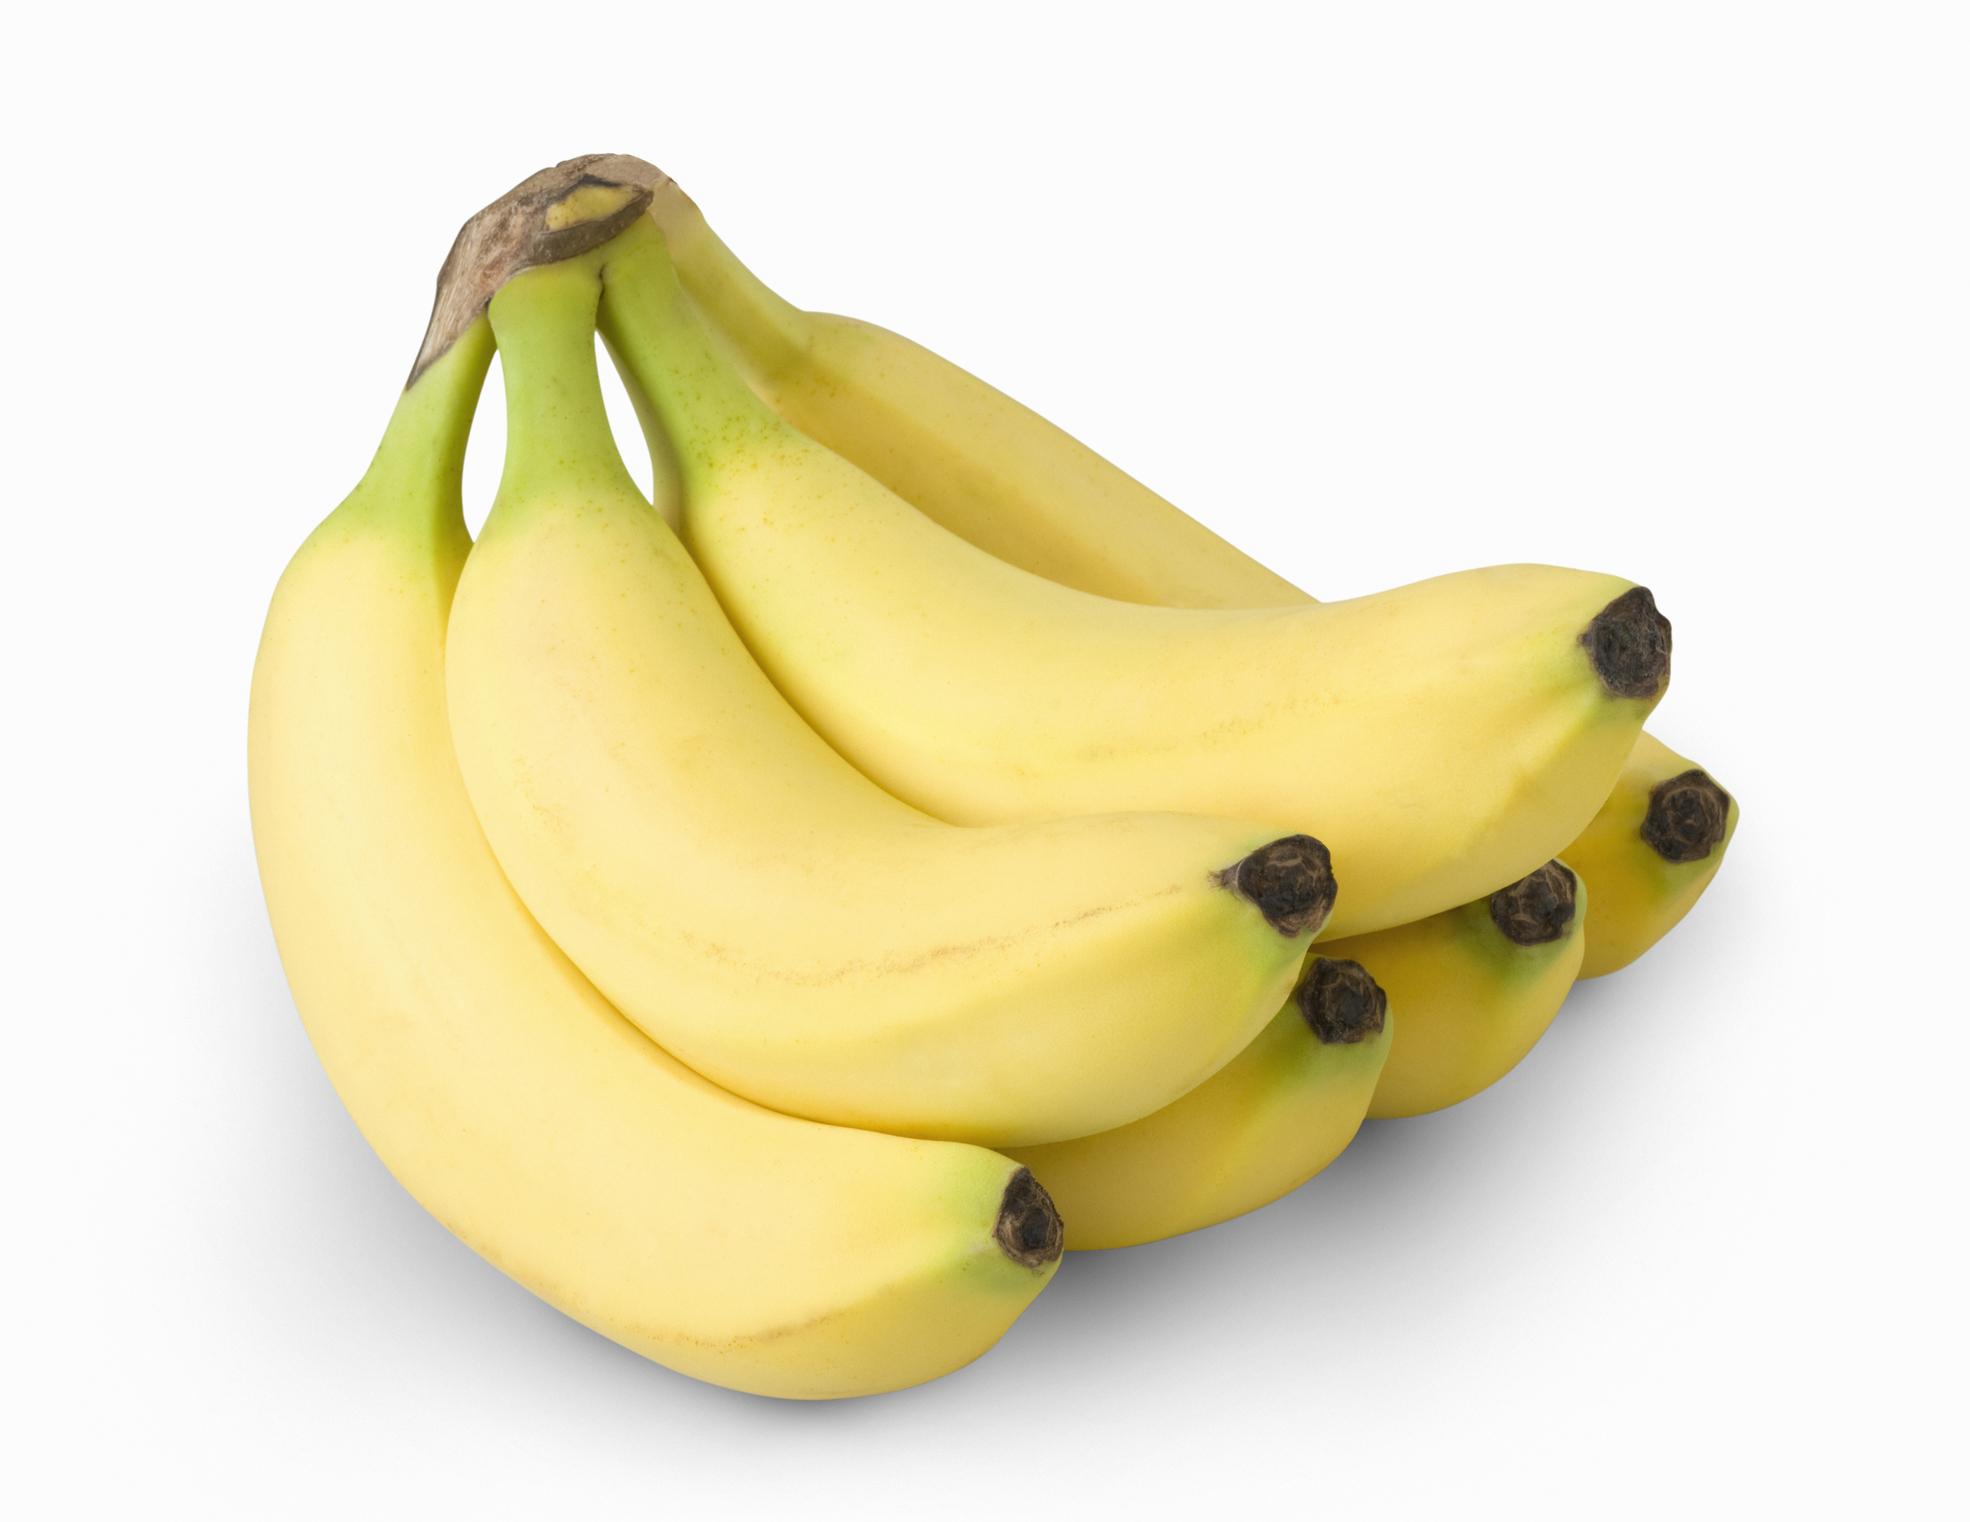 getty-bunch-of-bananas-recipe